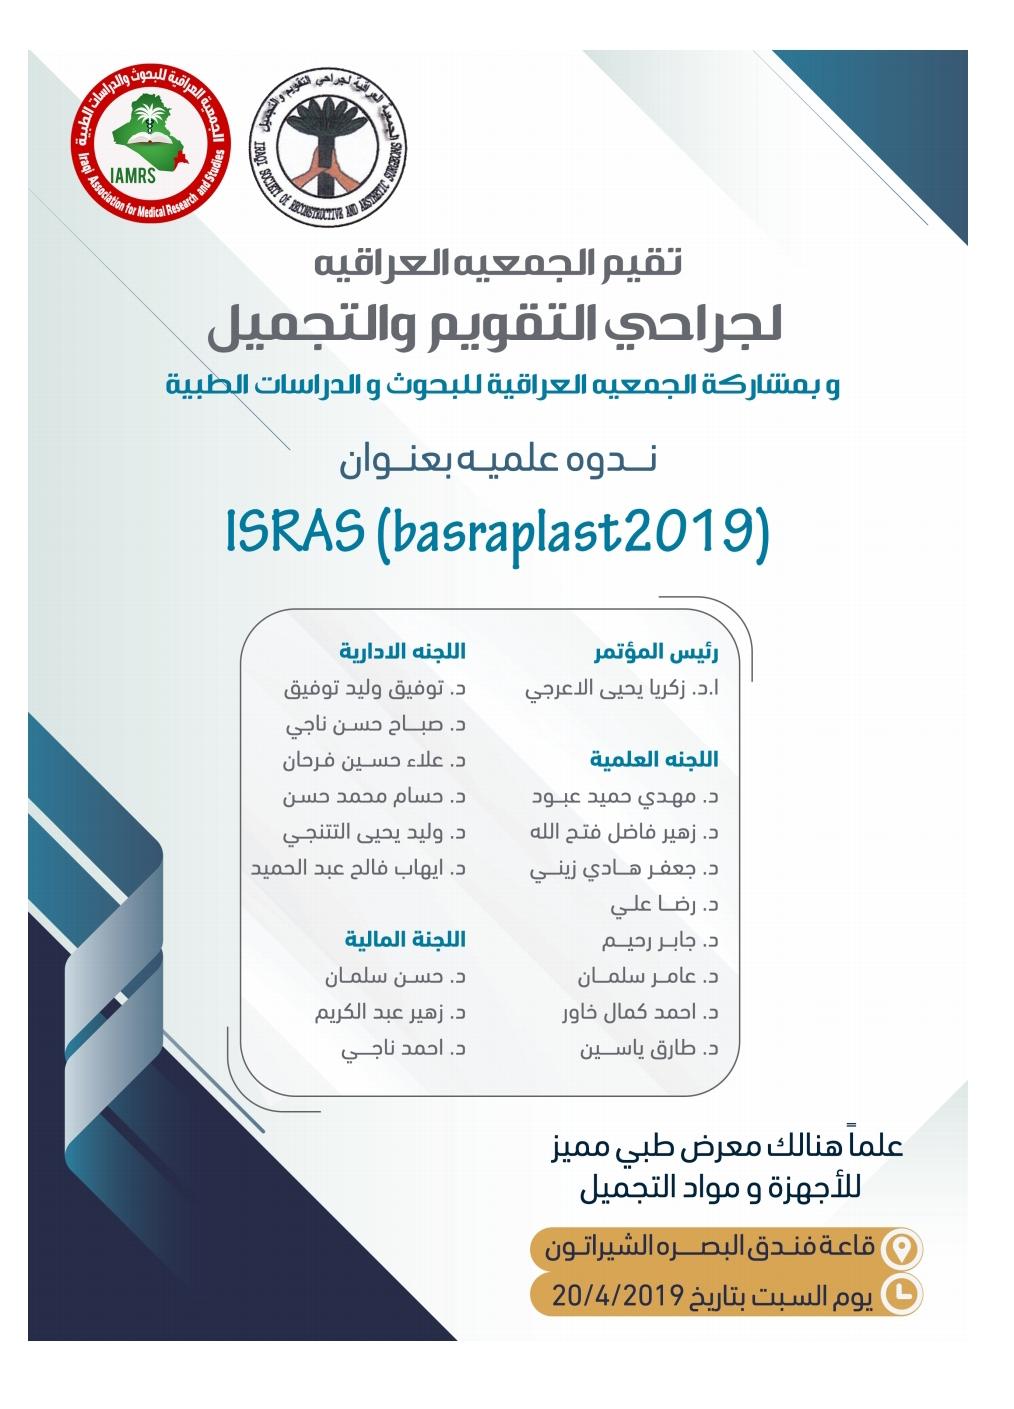 Basraplast 2019 Registration